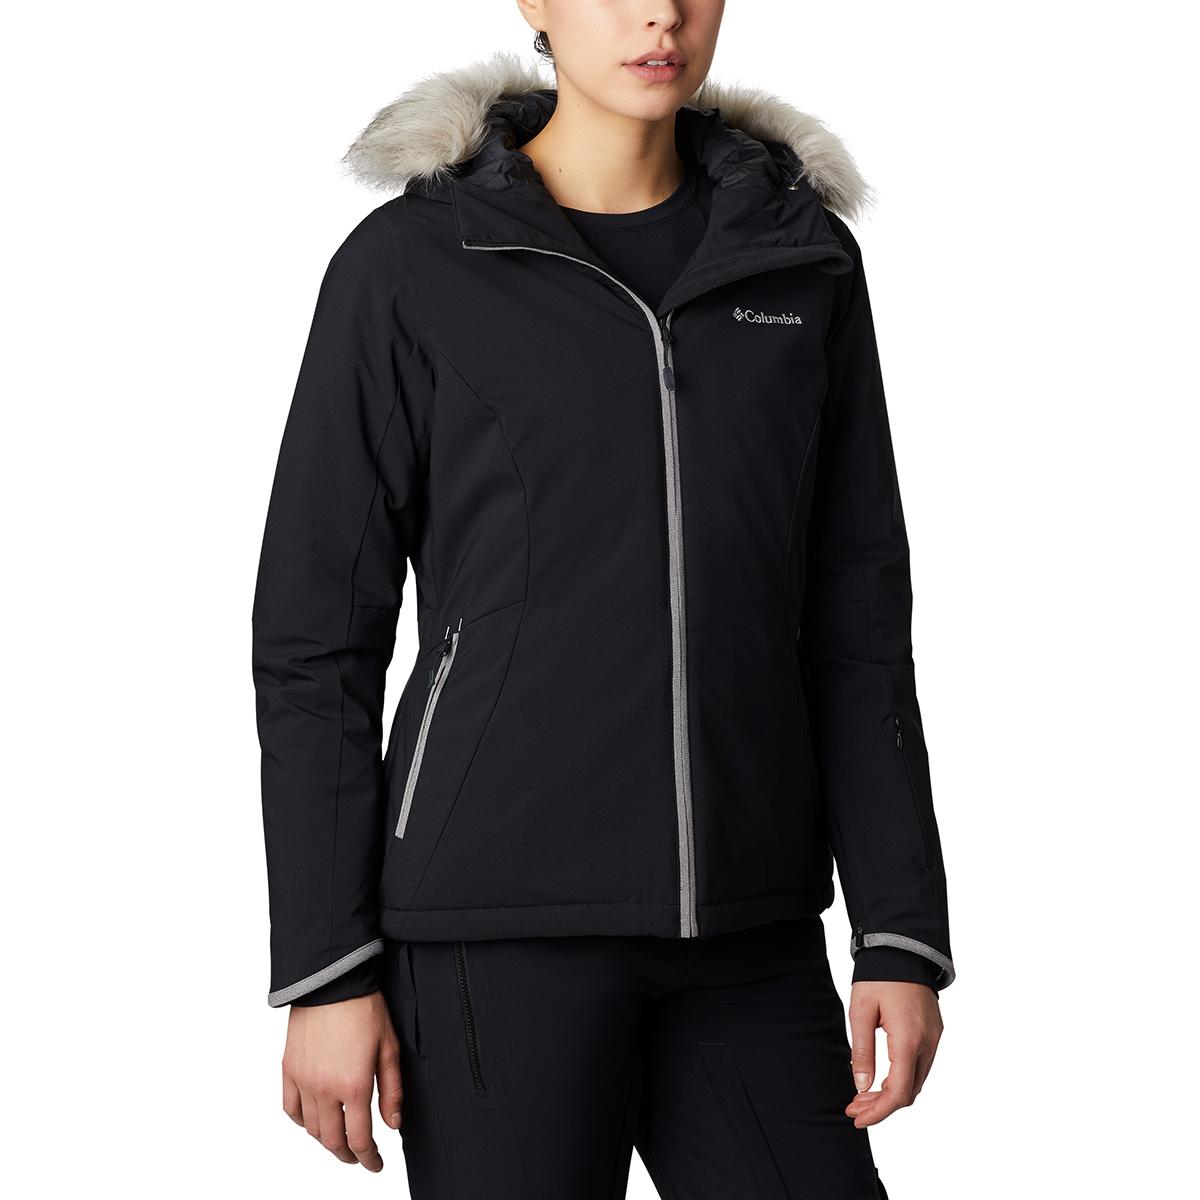 Columbia Women's Alpine Slide Jacket - Black, S